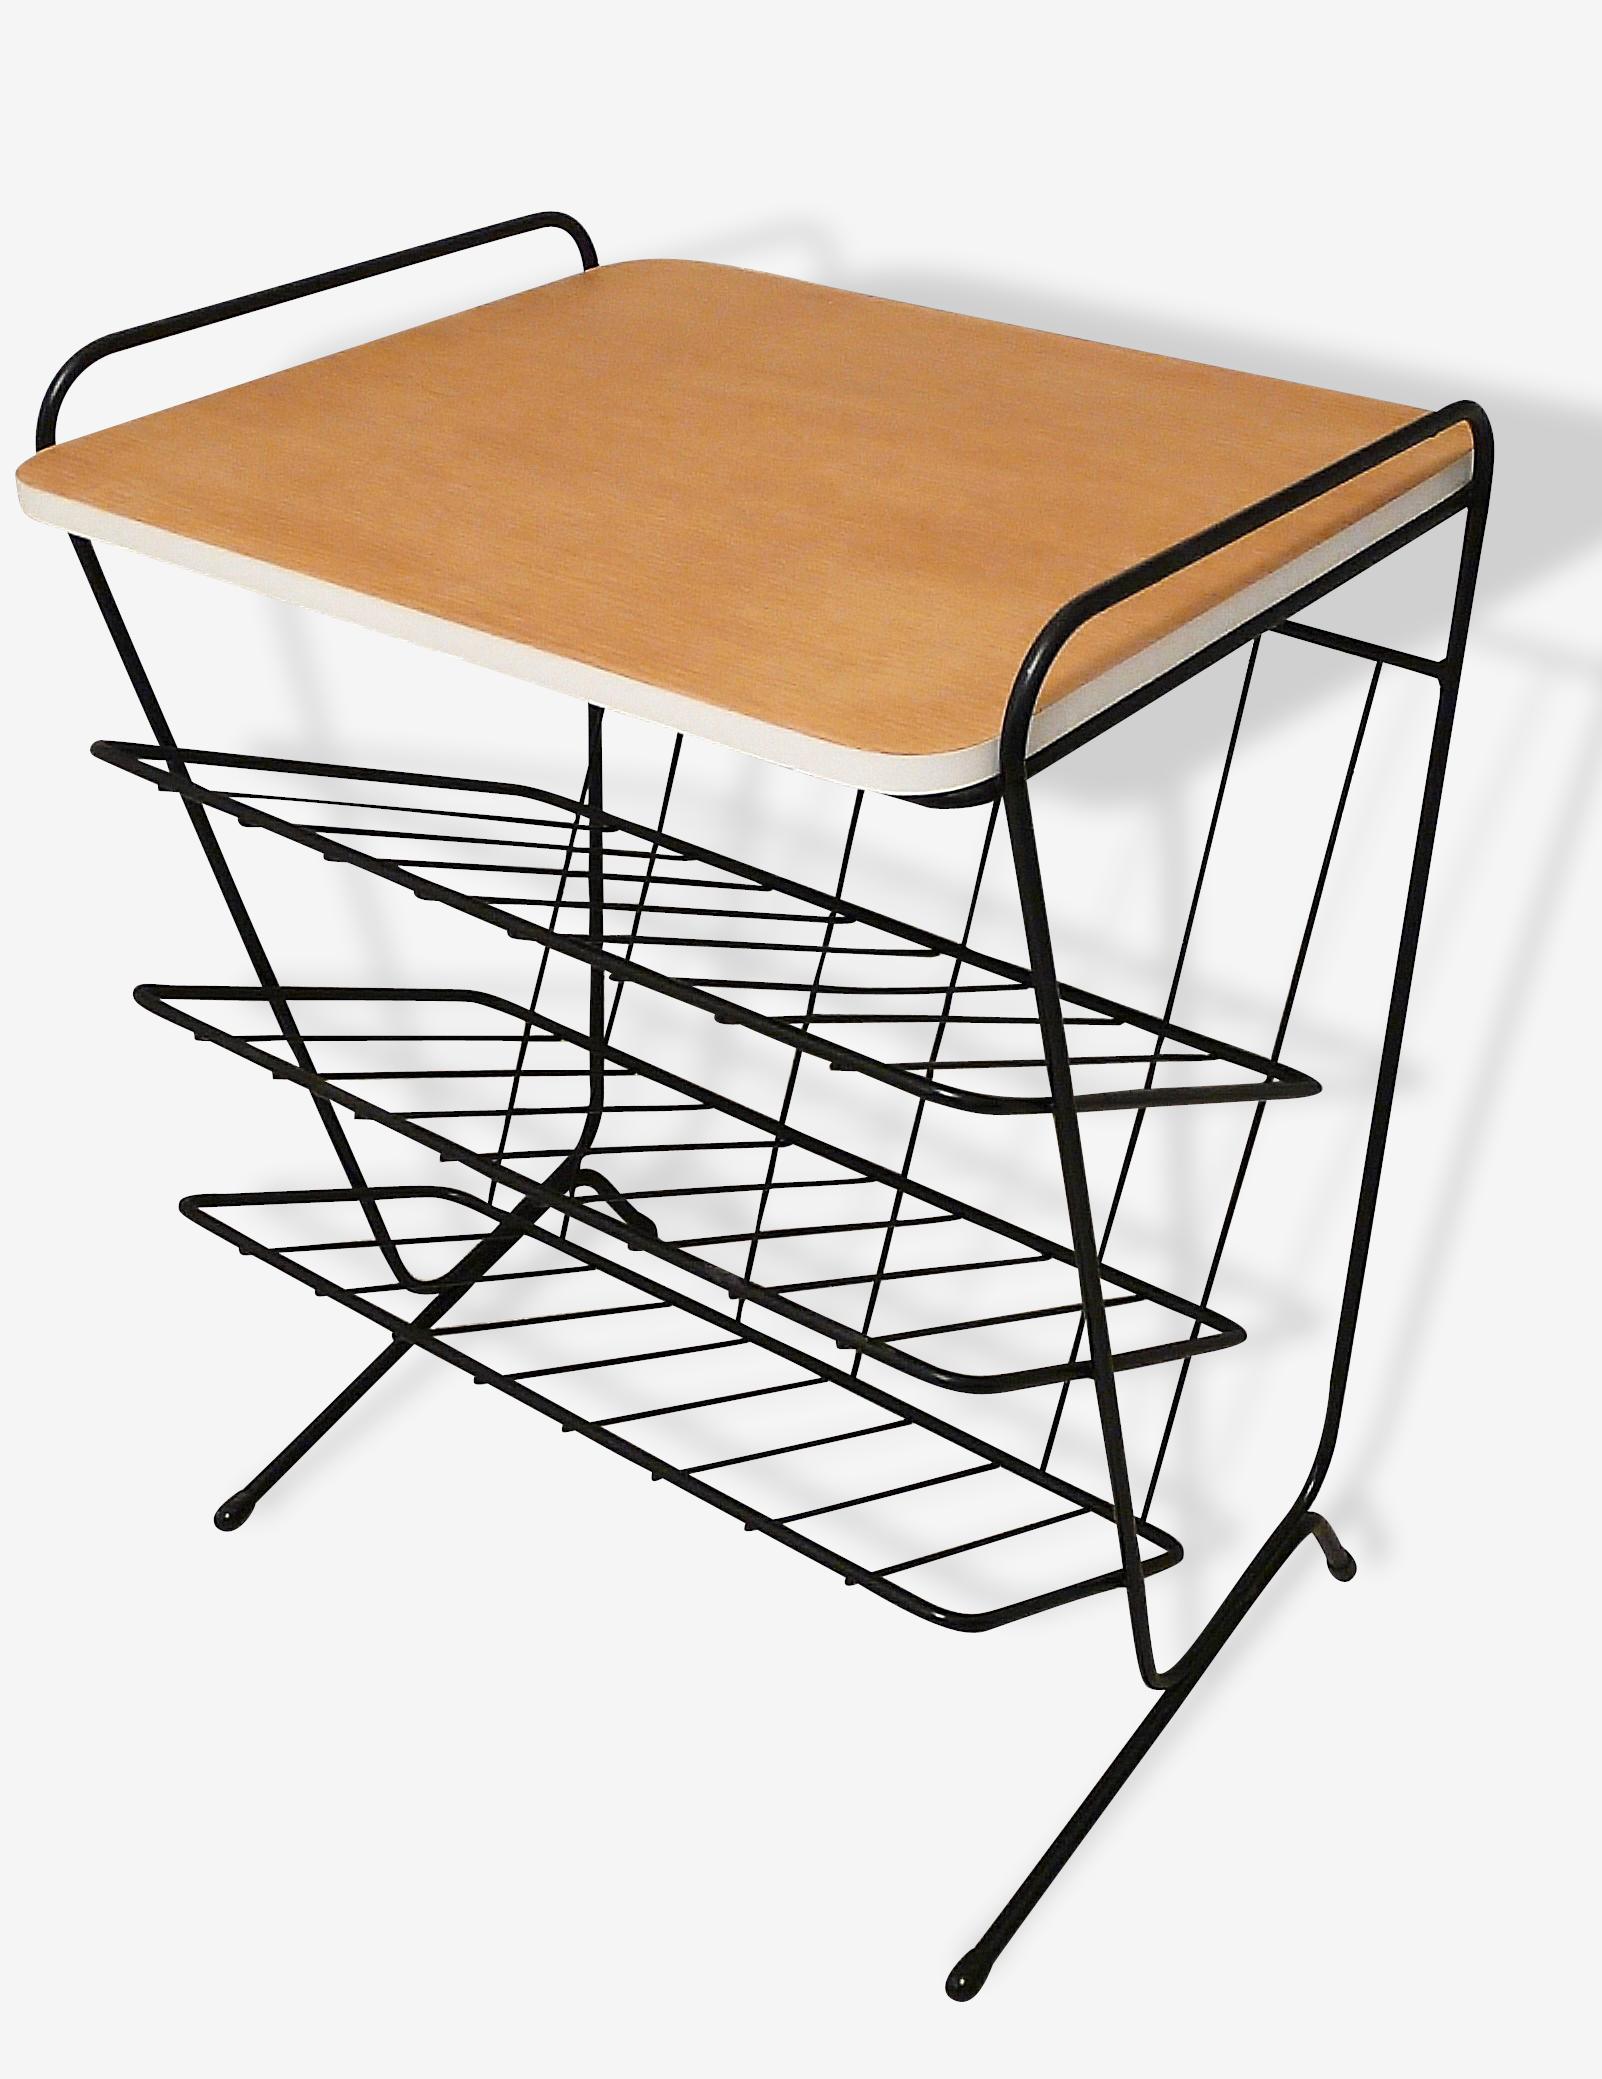 Table triple porte-vinyls